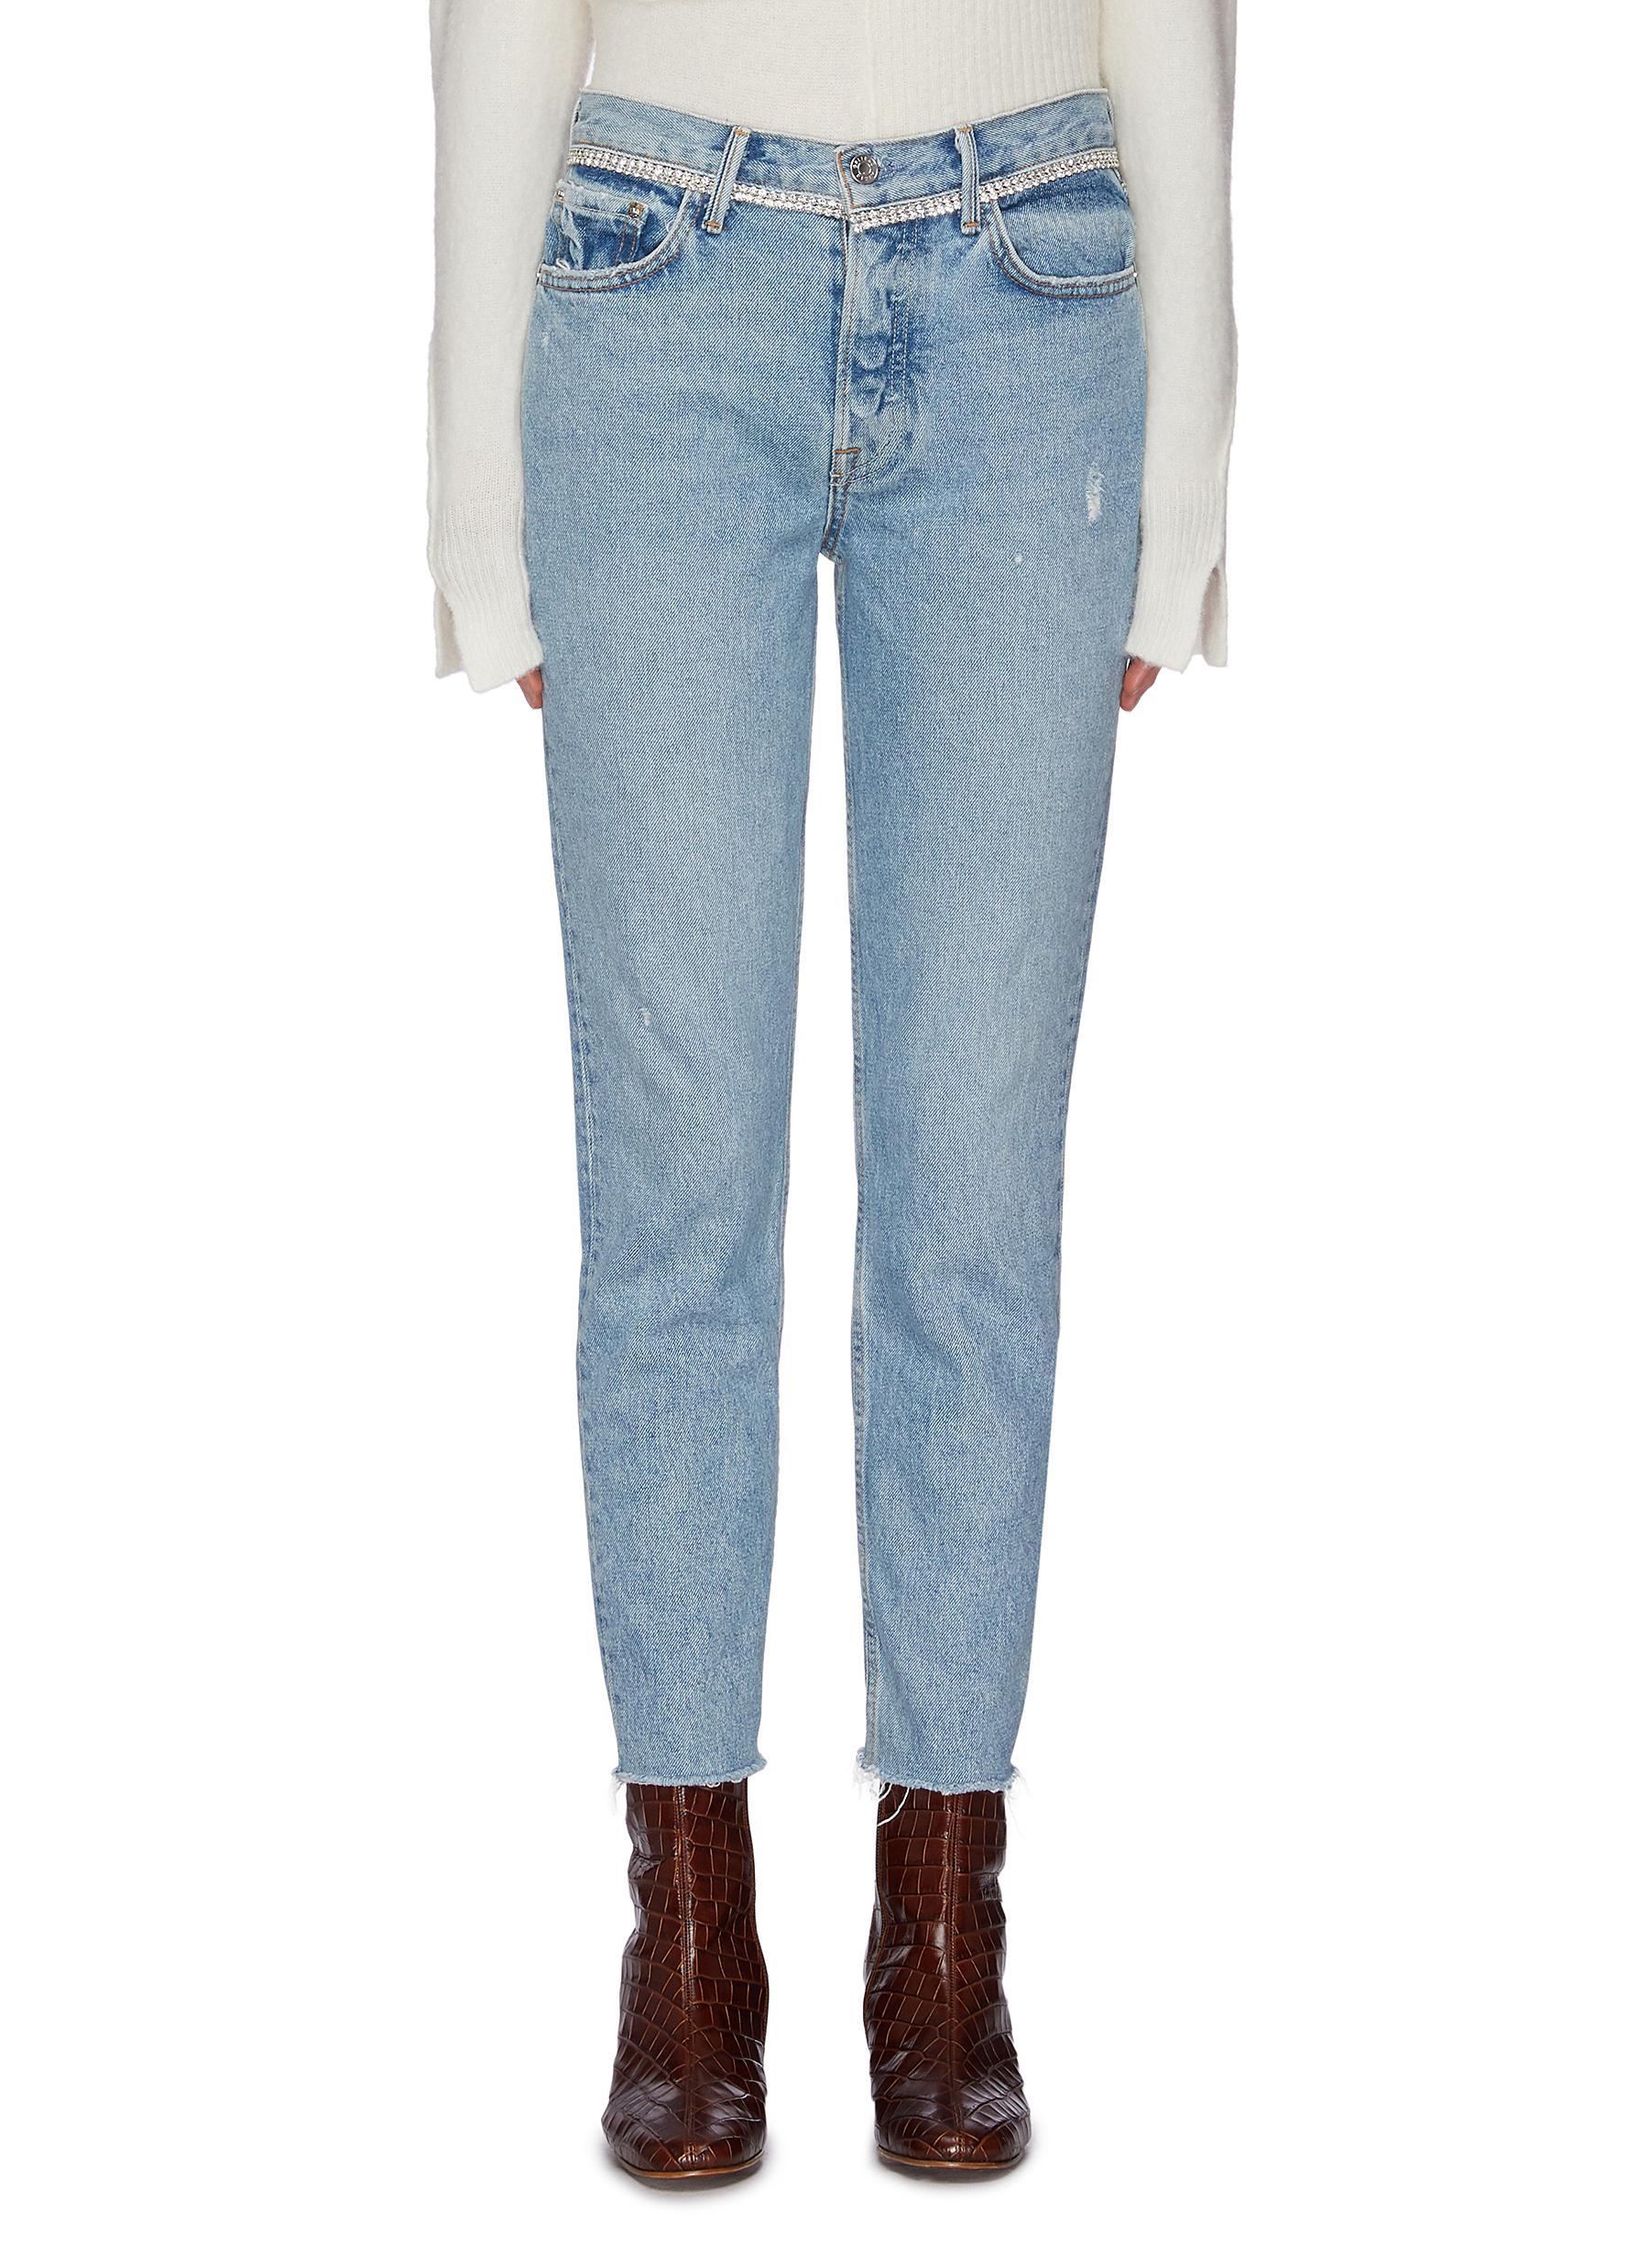 Buy Grlfrnd Jeans 'Karolina' diamanté waist frayed cuff cropped jeans